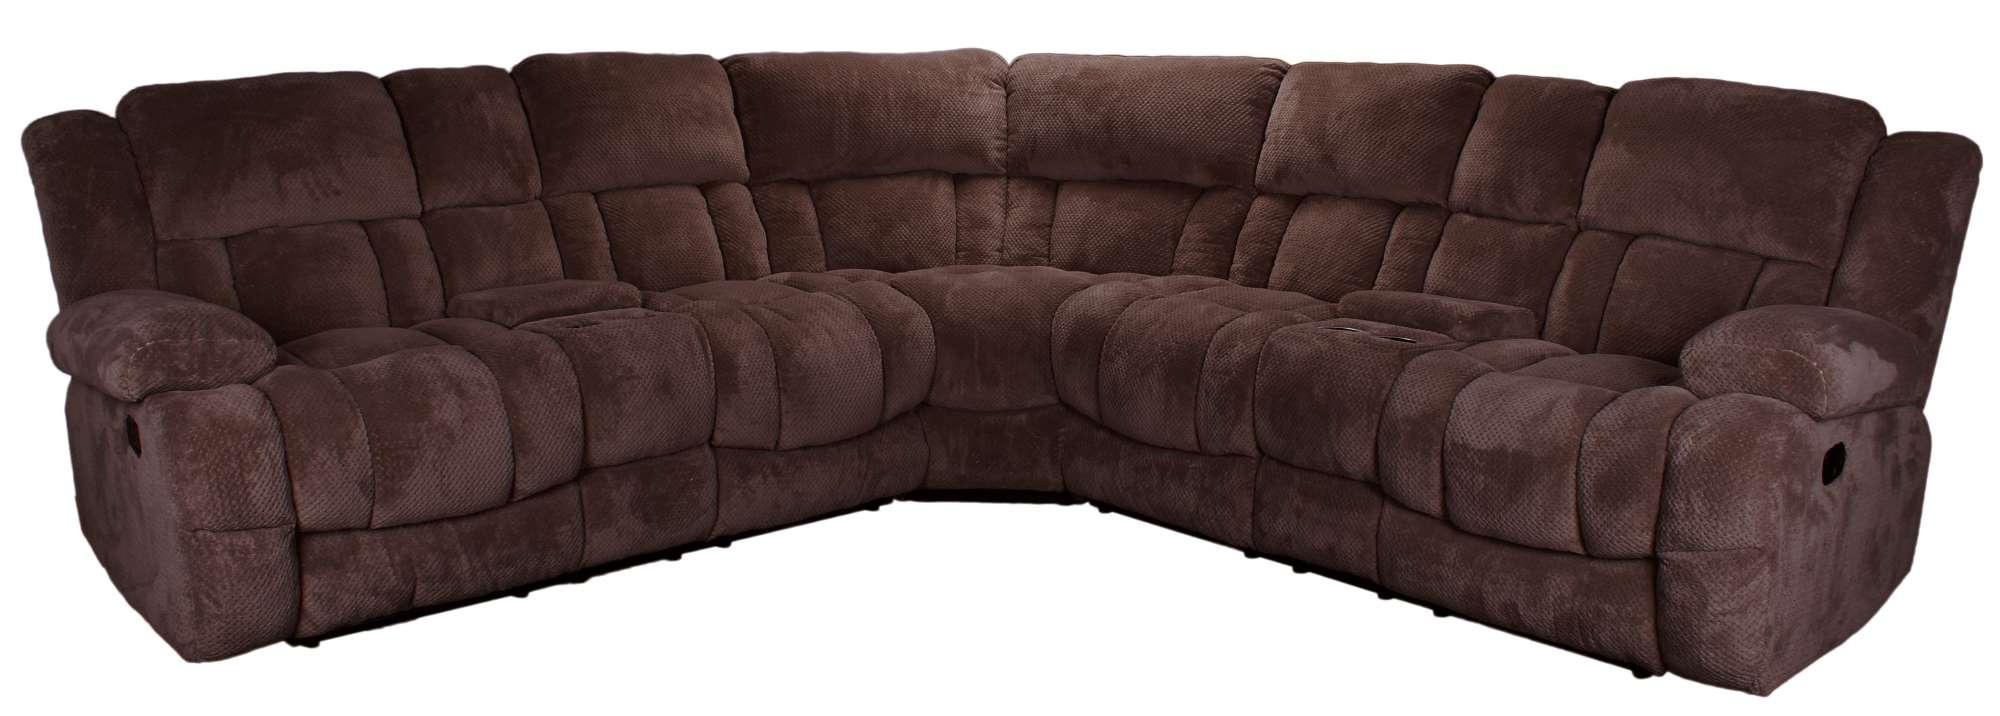 LR20407 3Piece Reclining Sectional Sofa